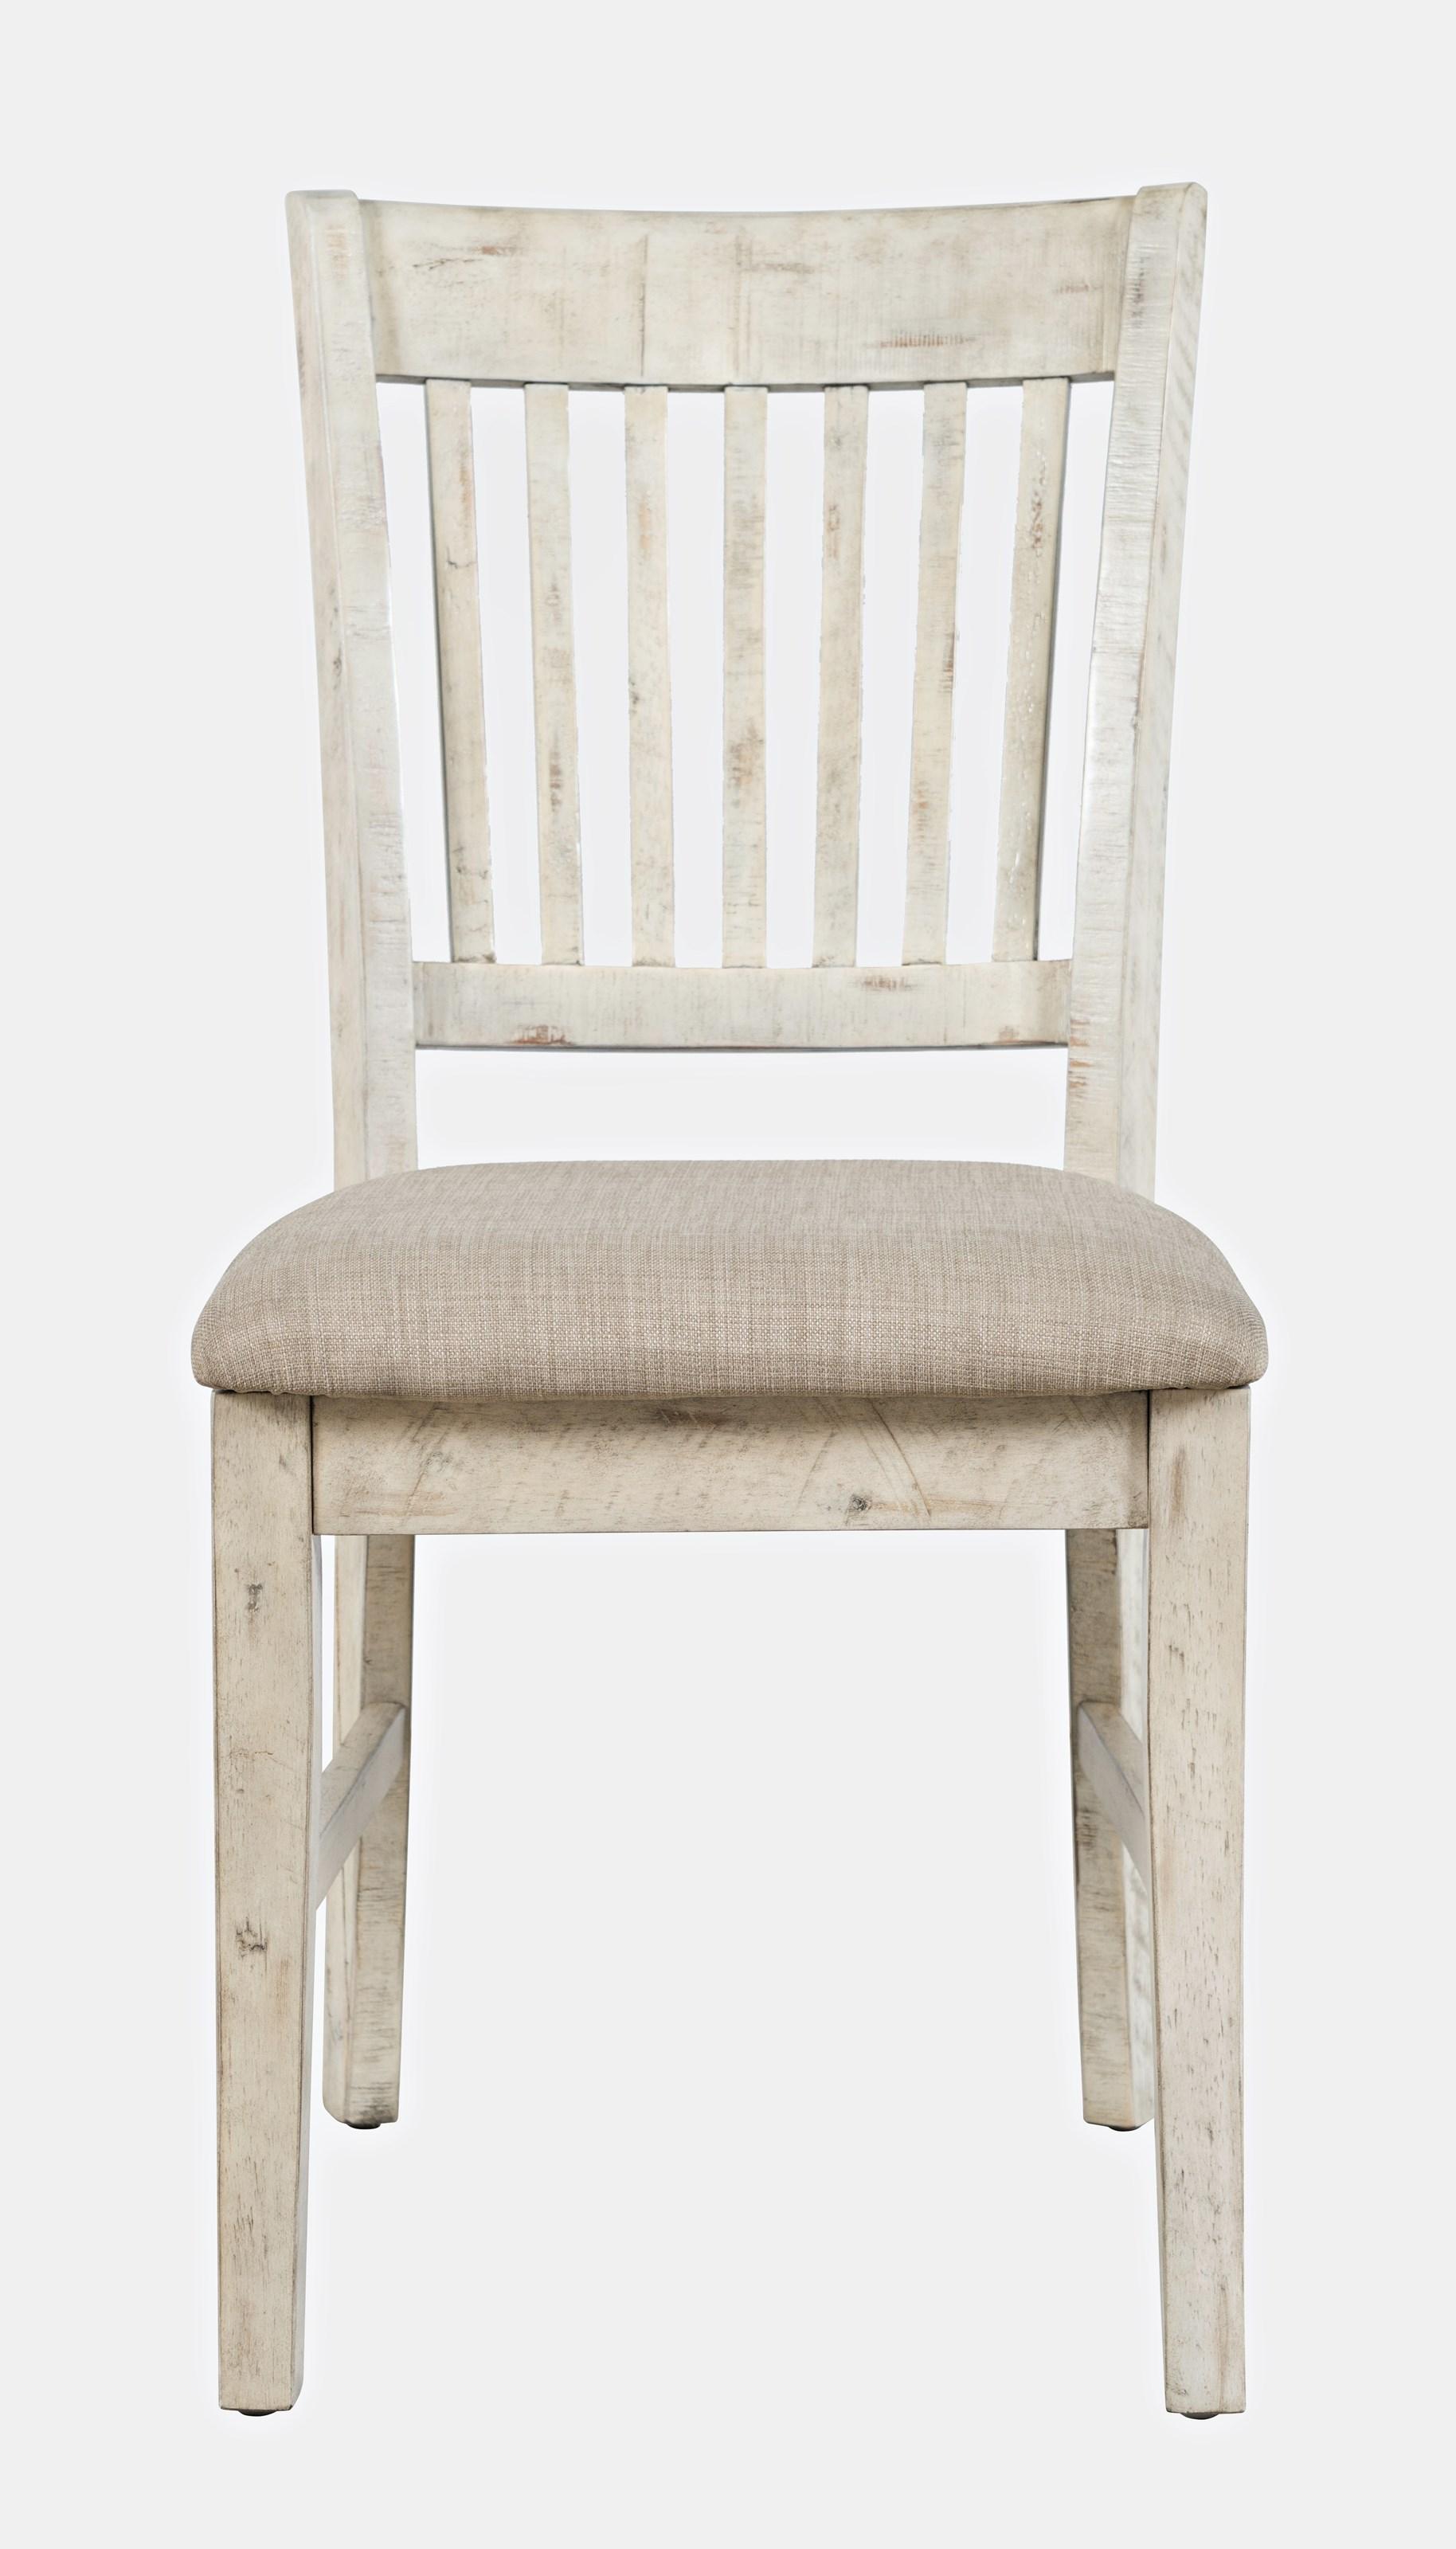 Rustic Shores Desk Chair by Jofran at Jofran